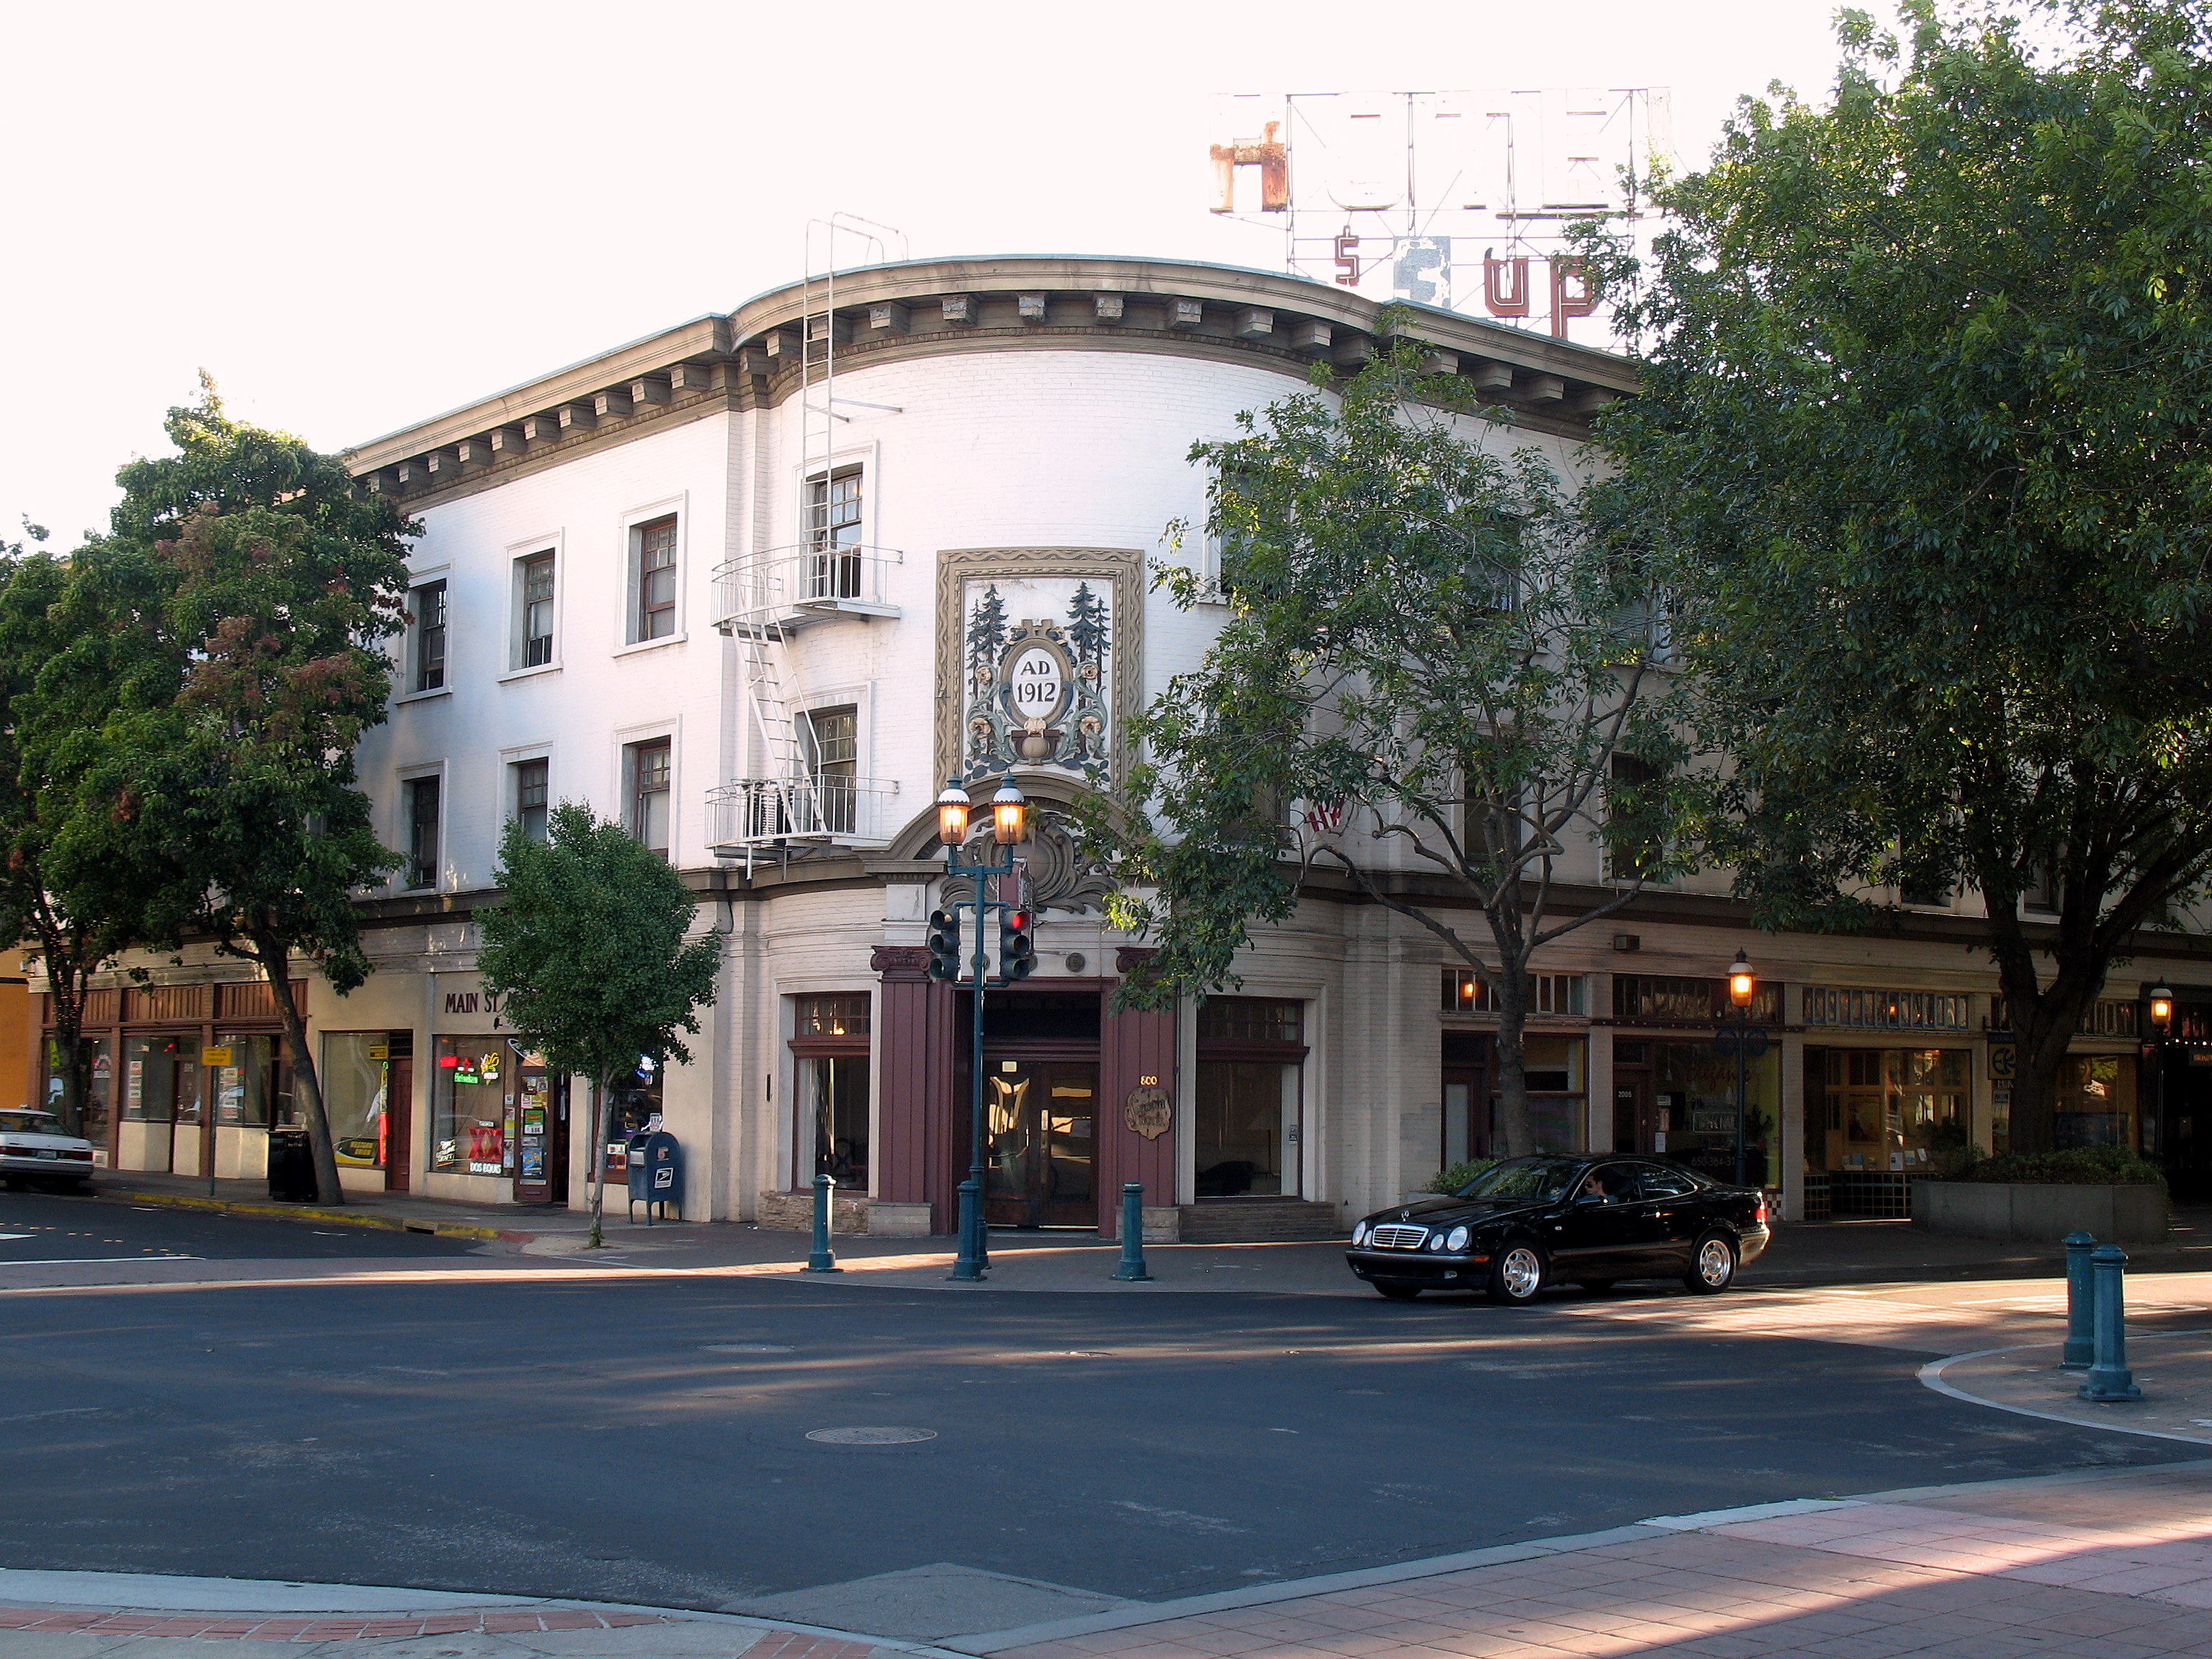 City Of Redwood City Building